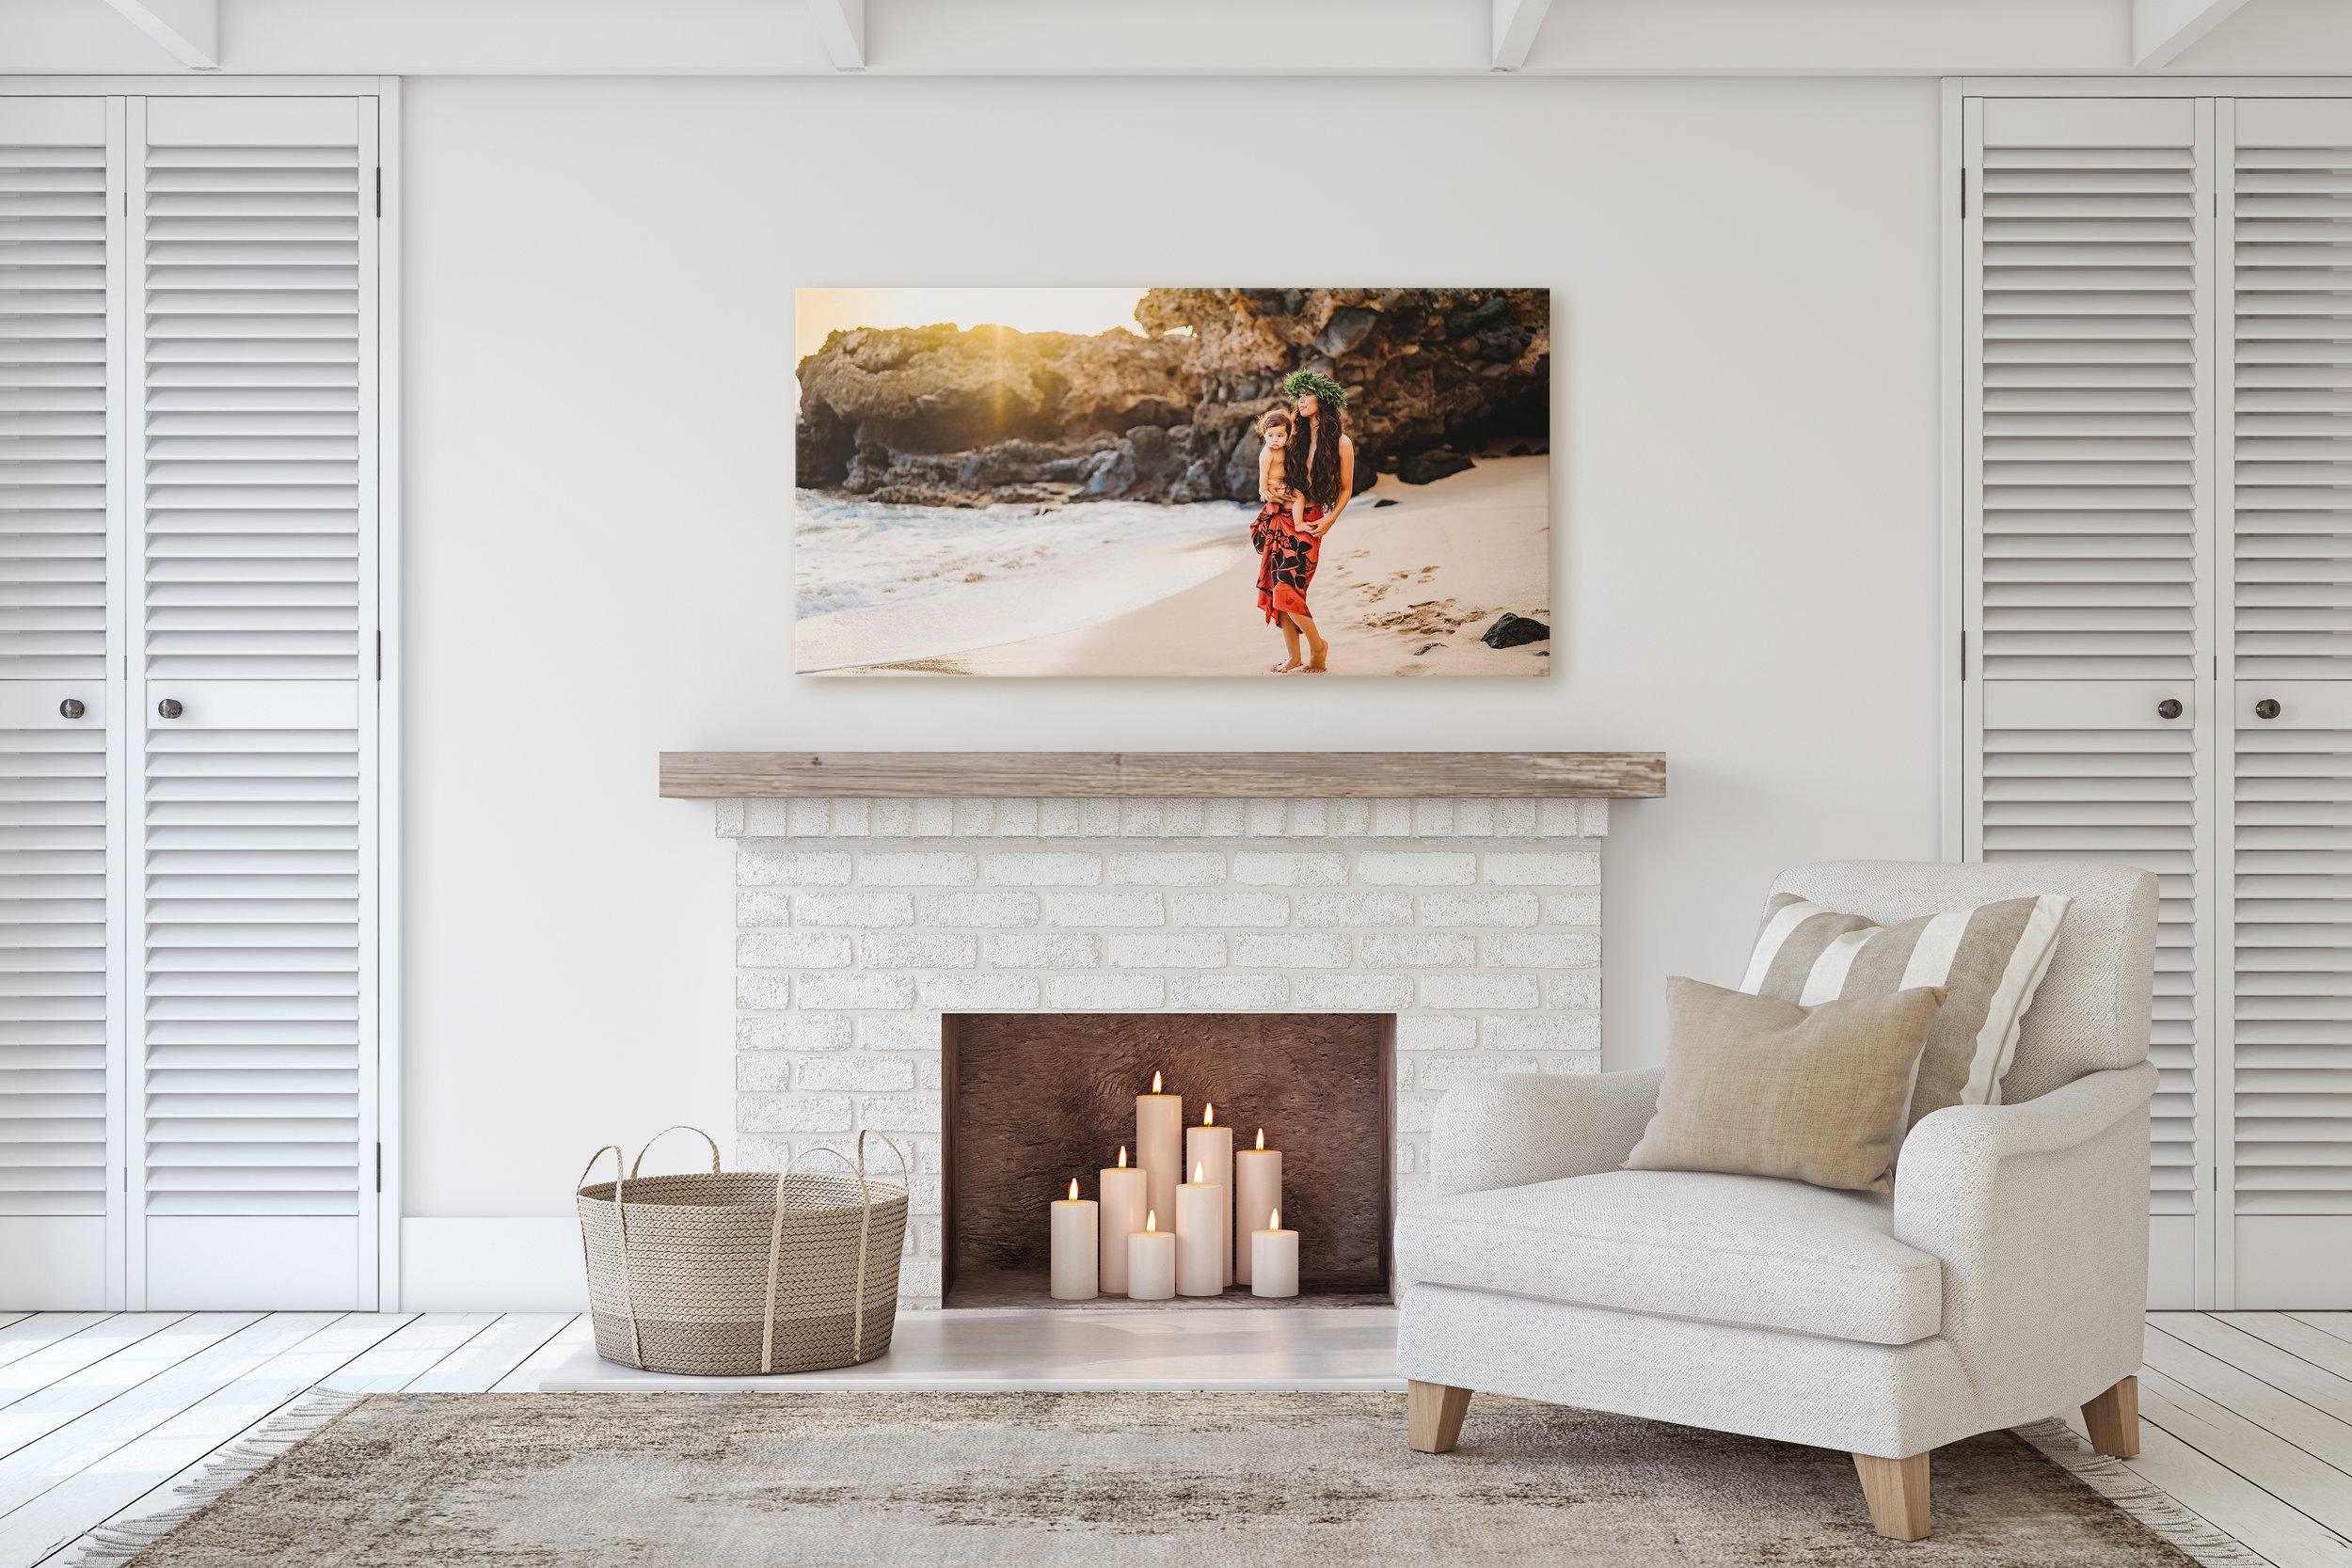 Mockup-Fireplace-1.jpg